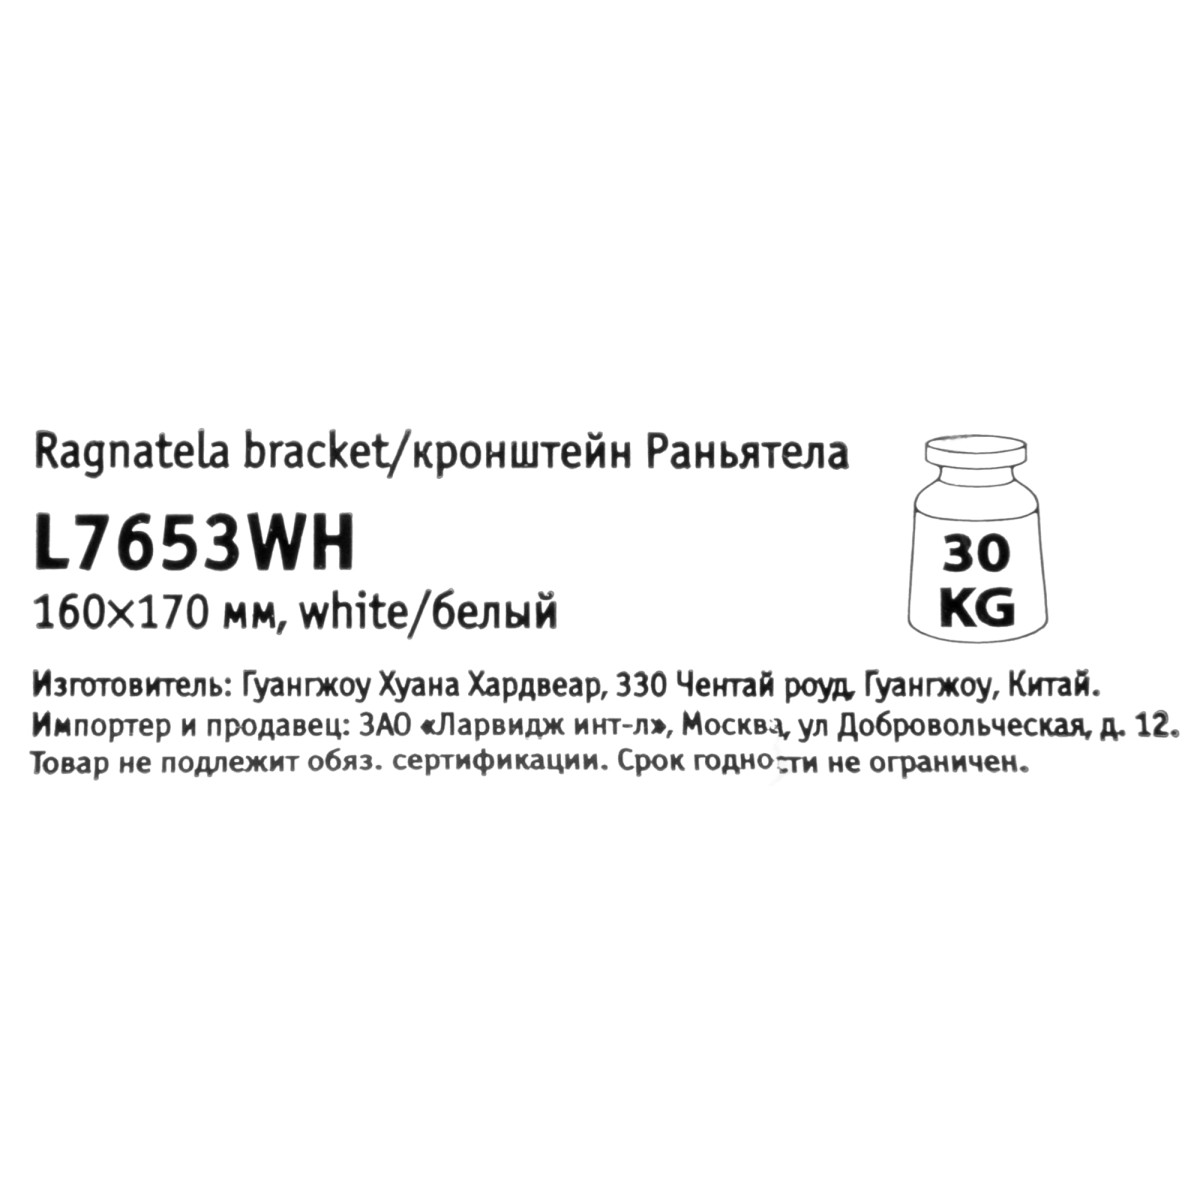 Кронейн Раньятела 160x170 Цвет Белый